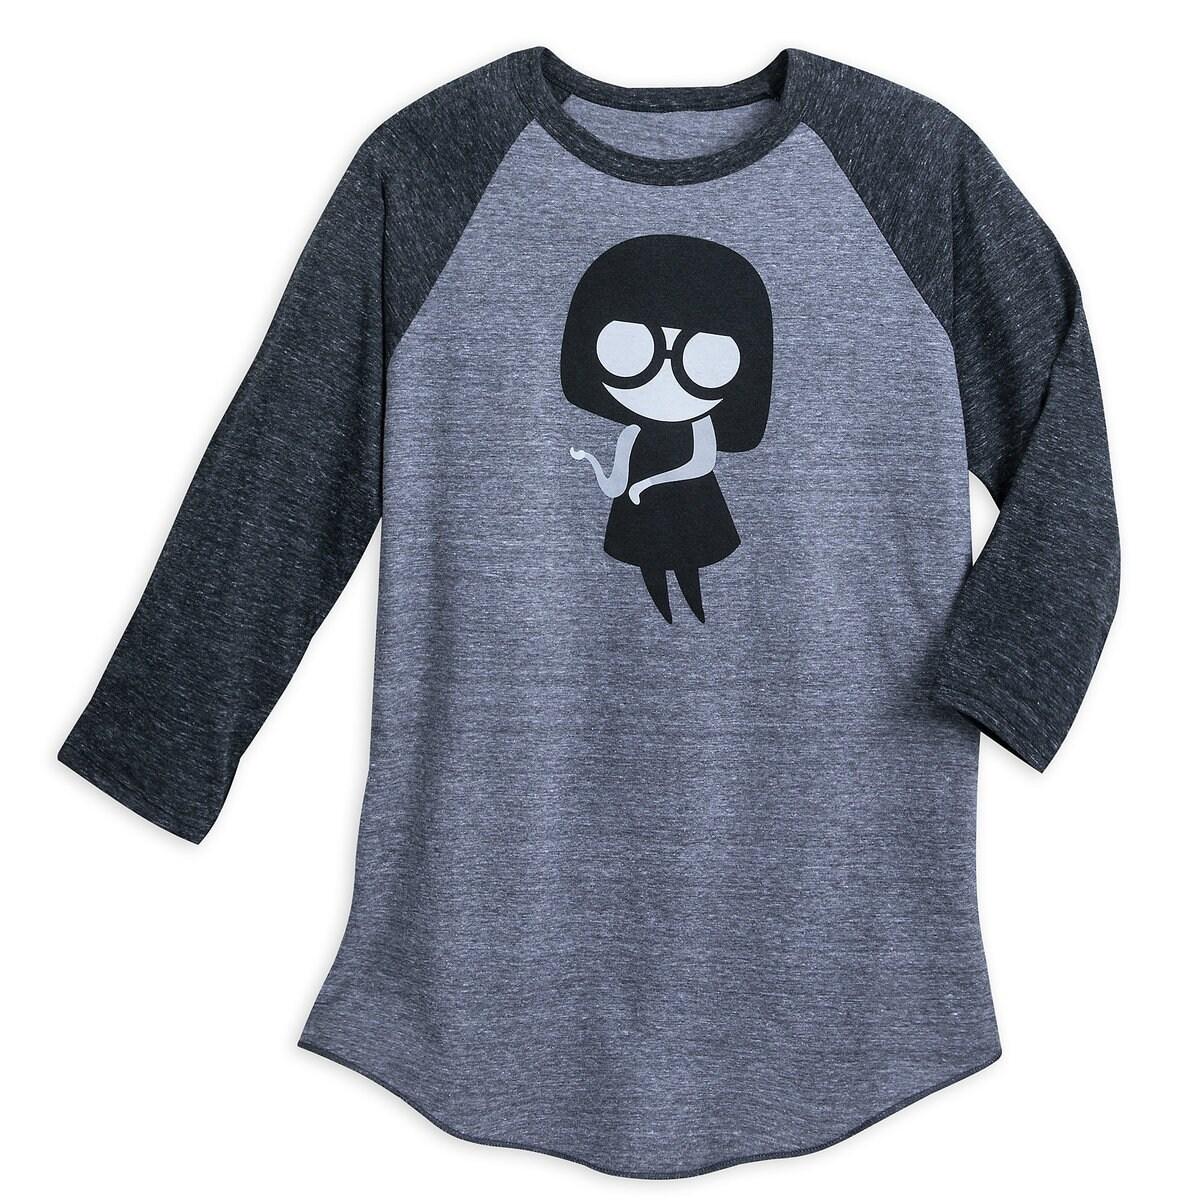 ee757fd5f Edna Mode ''No Capes'' Raglan T-Shirt for Women | shopDisney